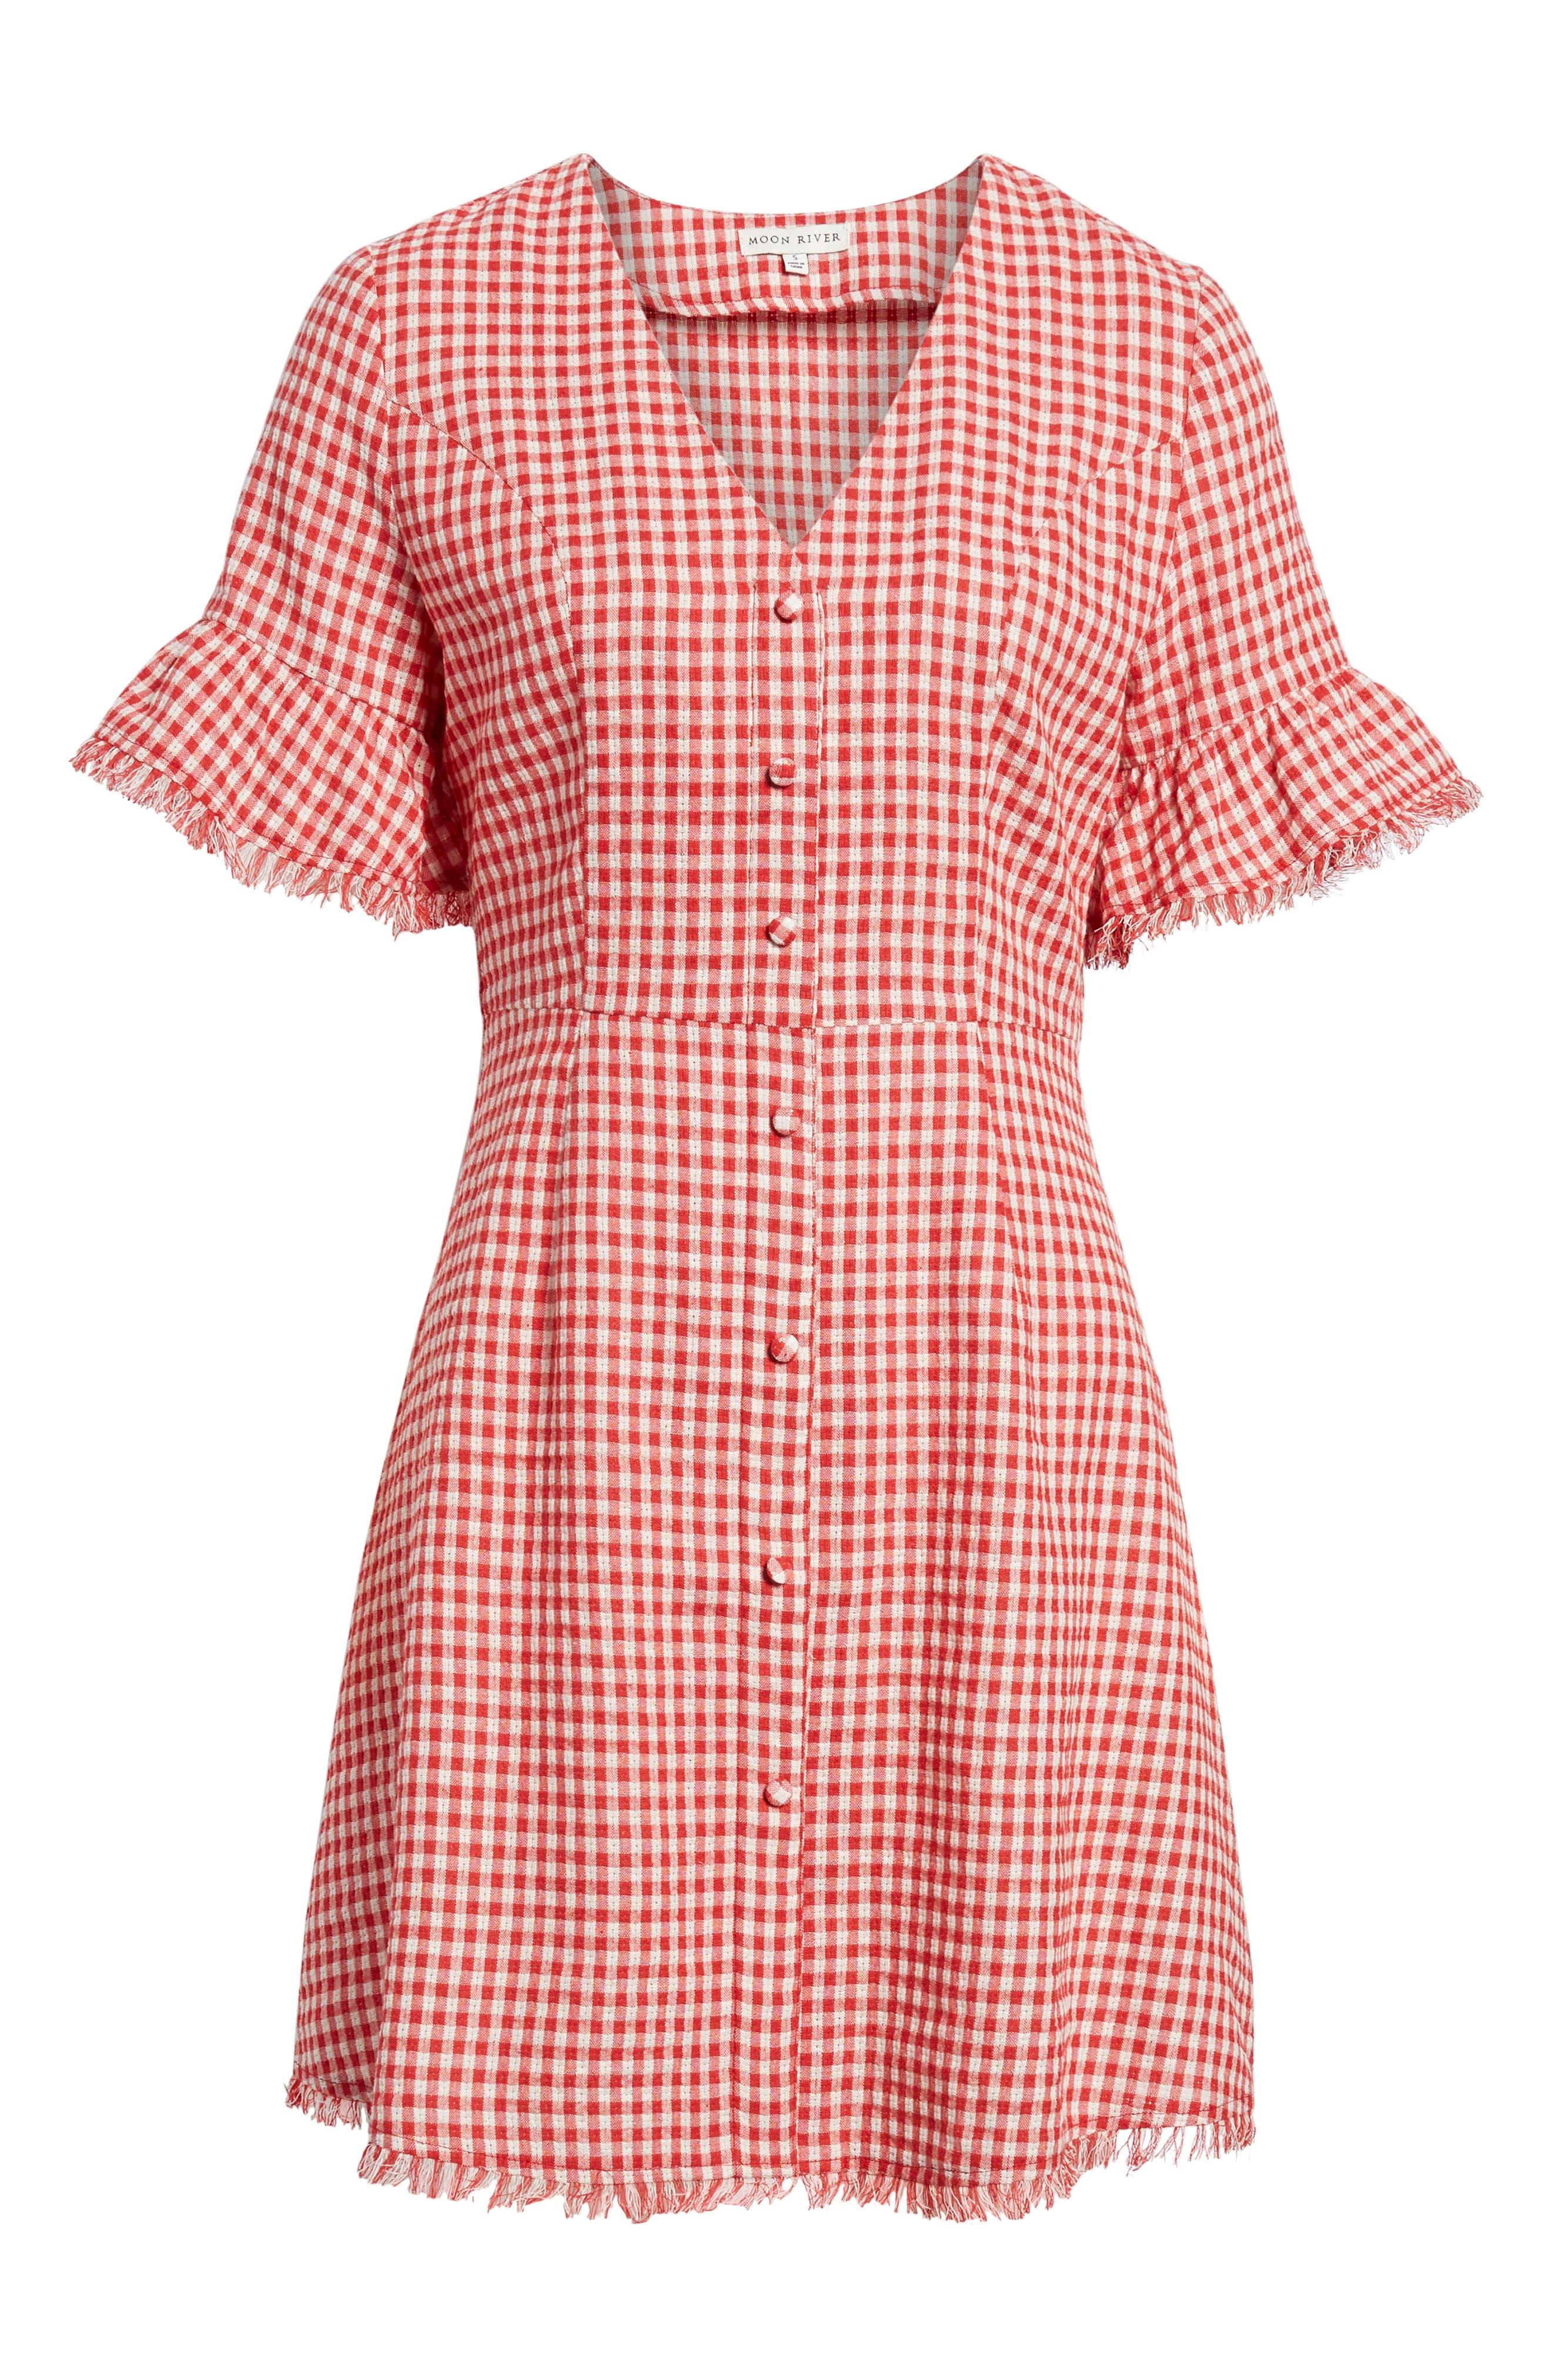 Gingham Ruffle Sleeve Dress,                             Alternate thumbnail 7, color,                             Red Gingham